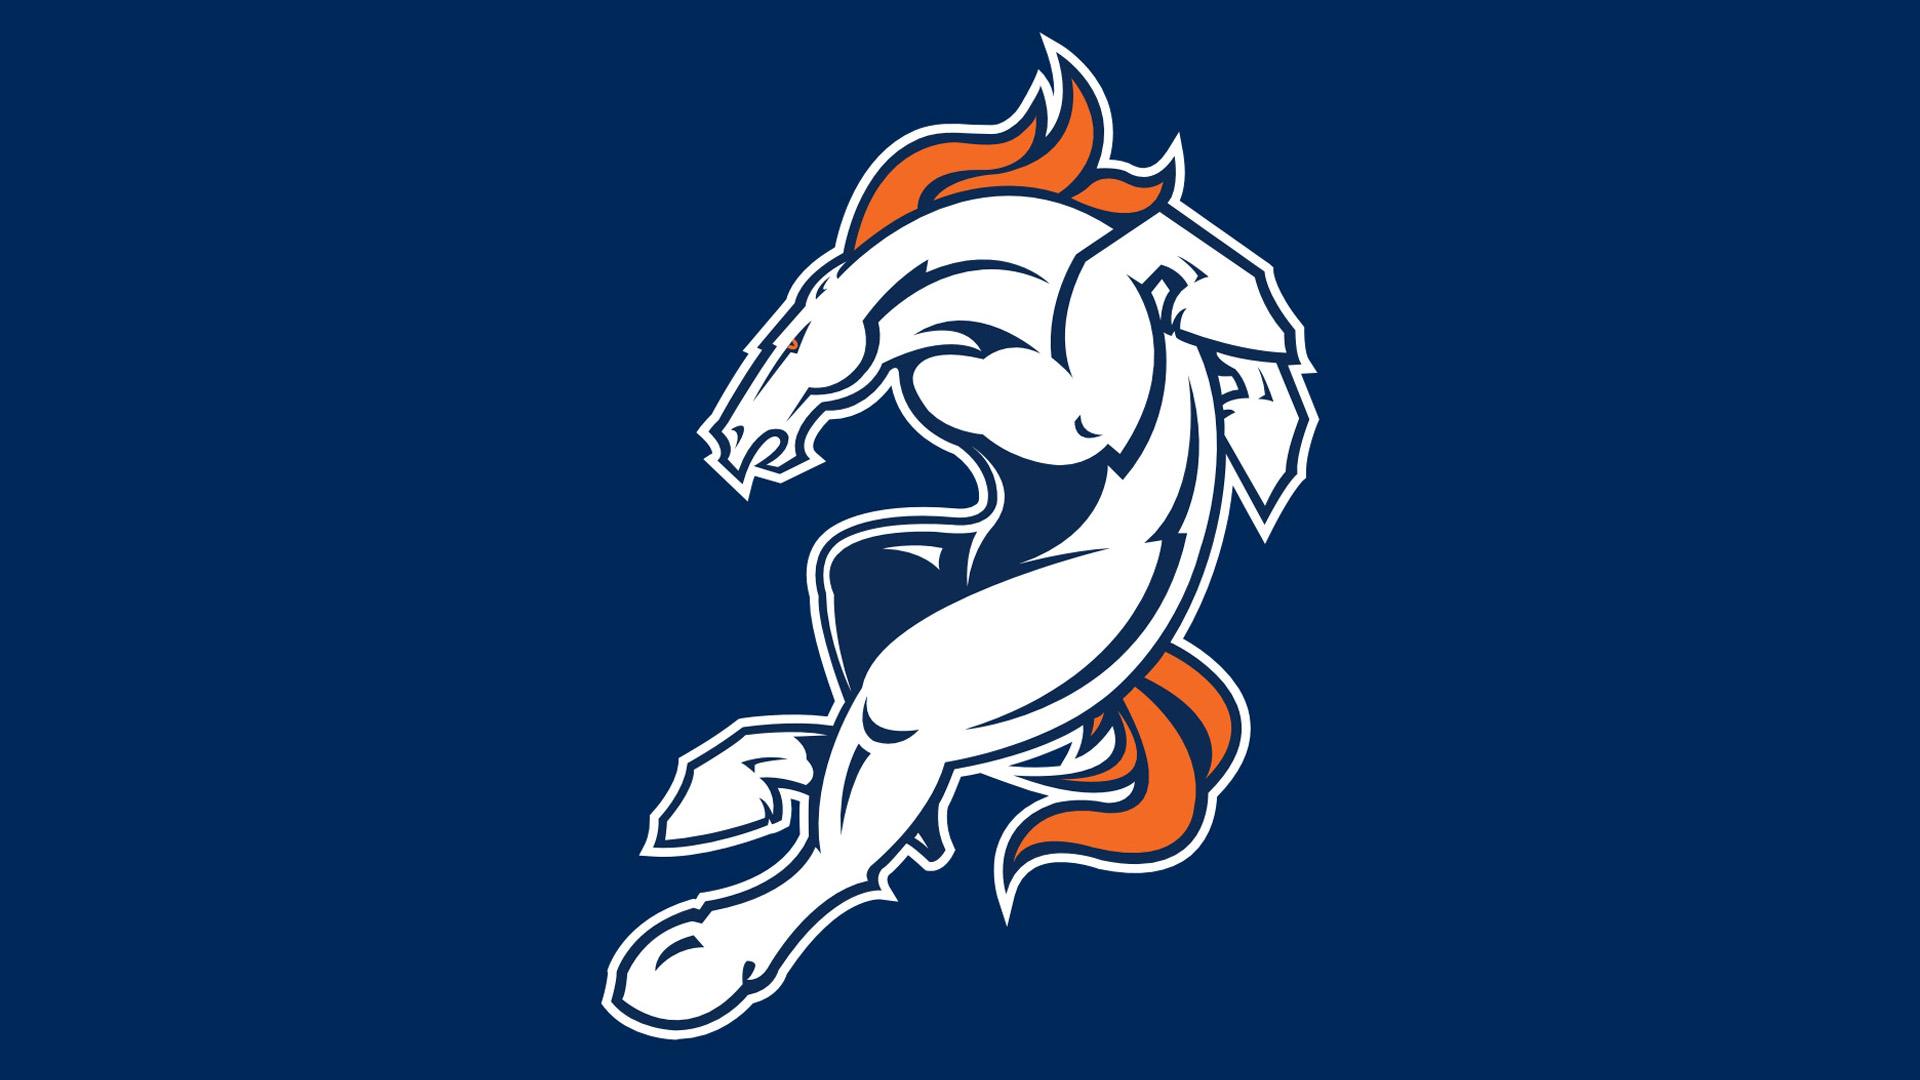 Denver Broncos Wallpaper 265043